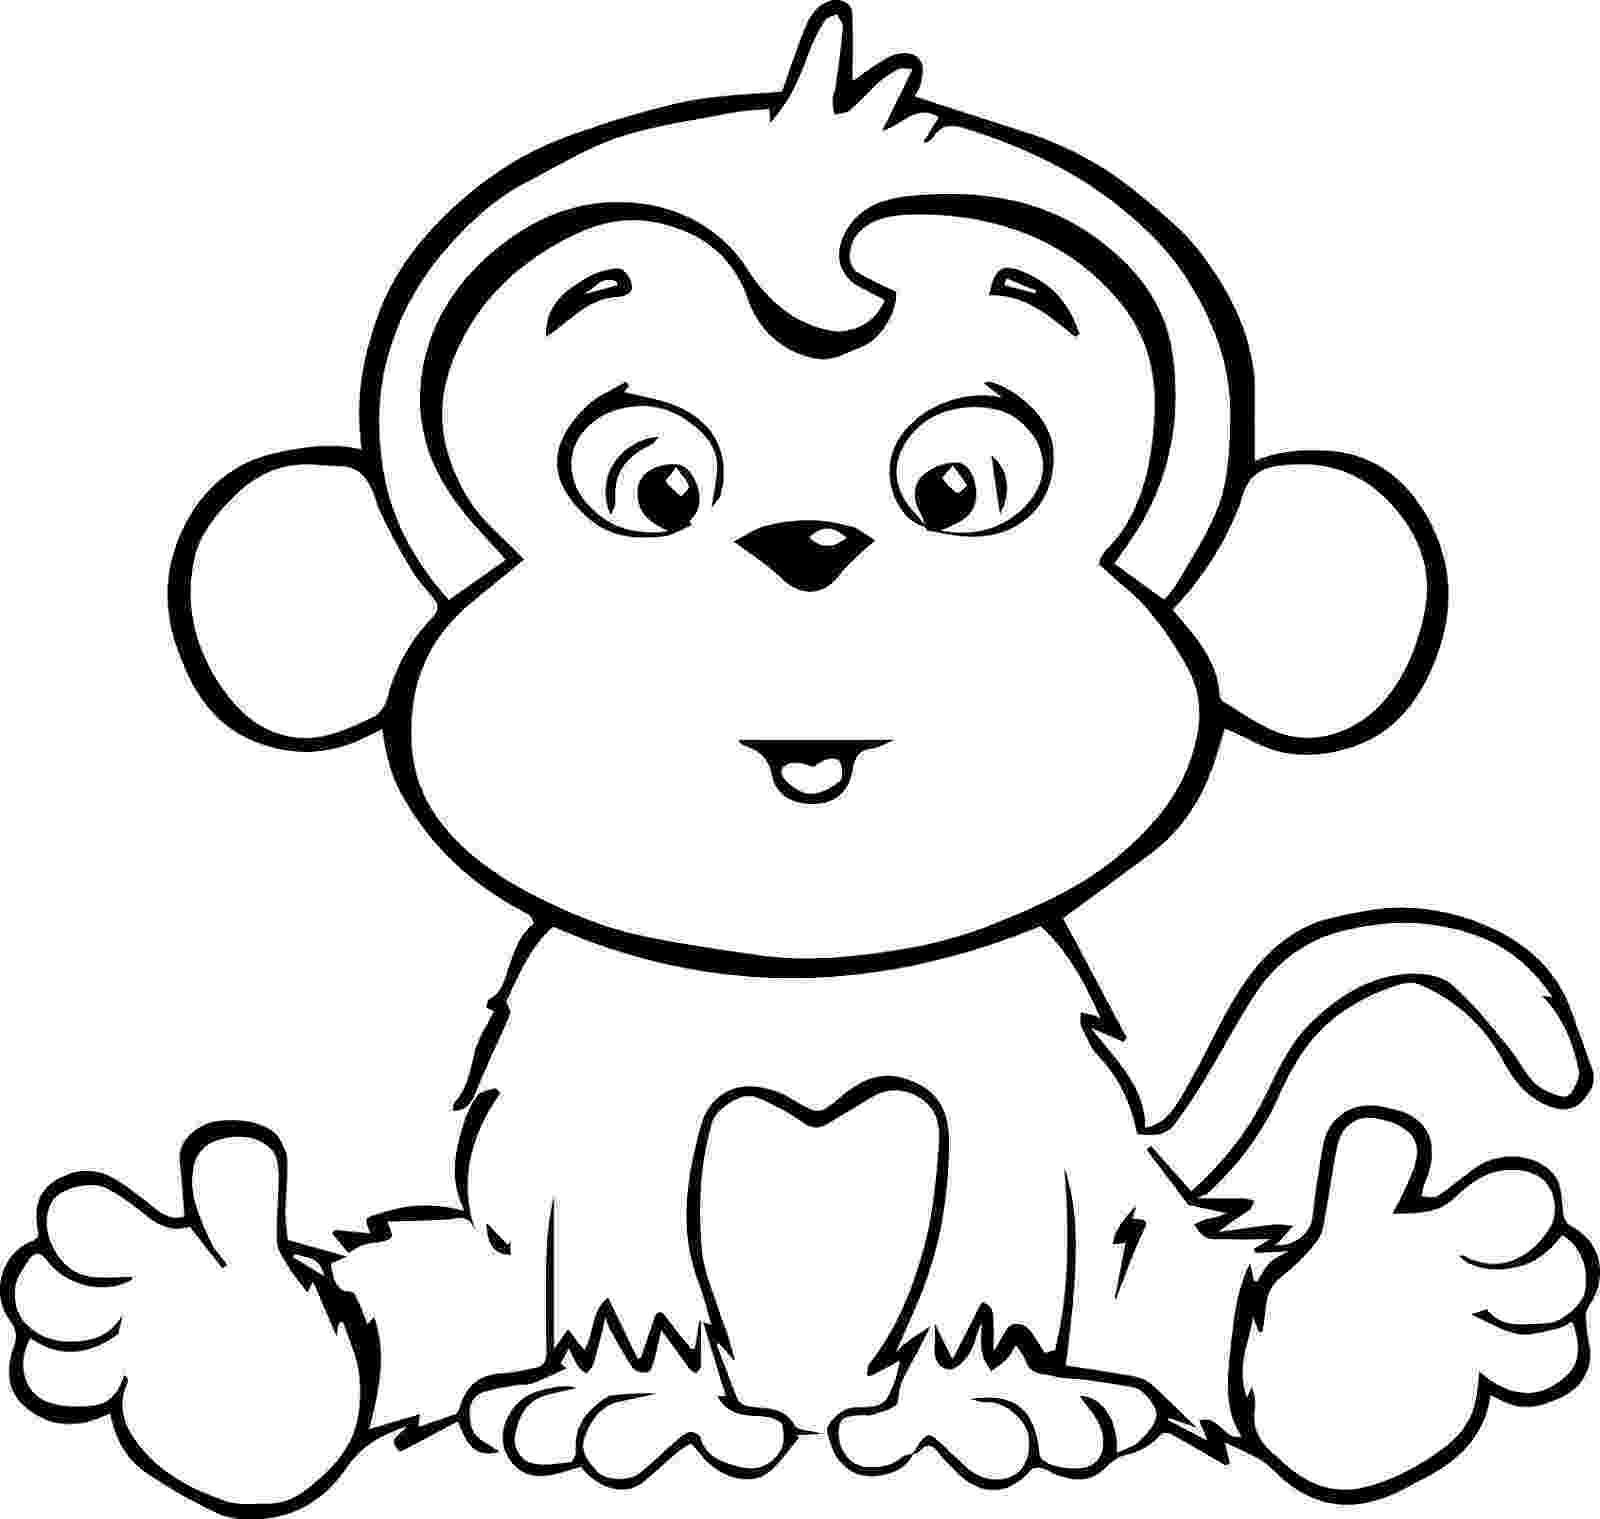 printable coloring pages monkeys monkey coloring pages coloring pages to print coloring pages monkeys printable